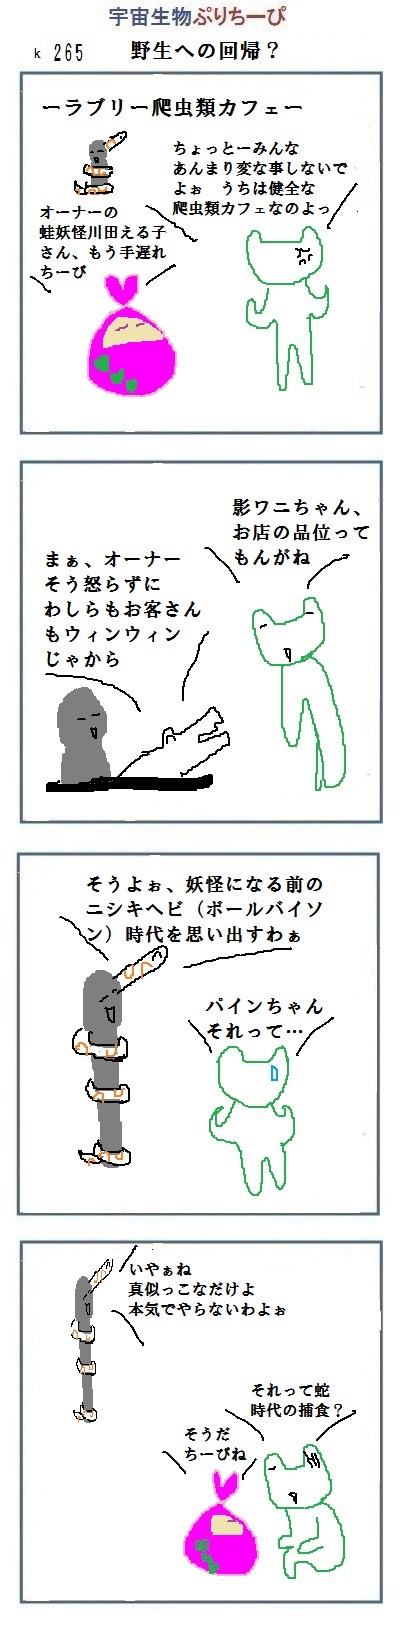 201702021901163ed.jpg